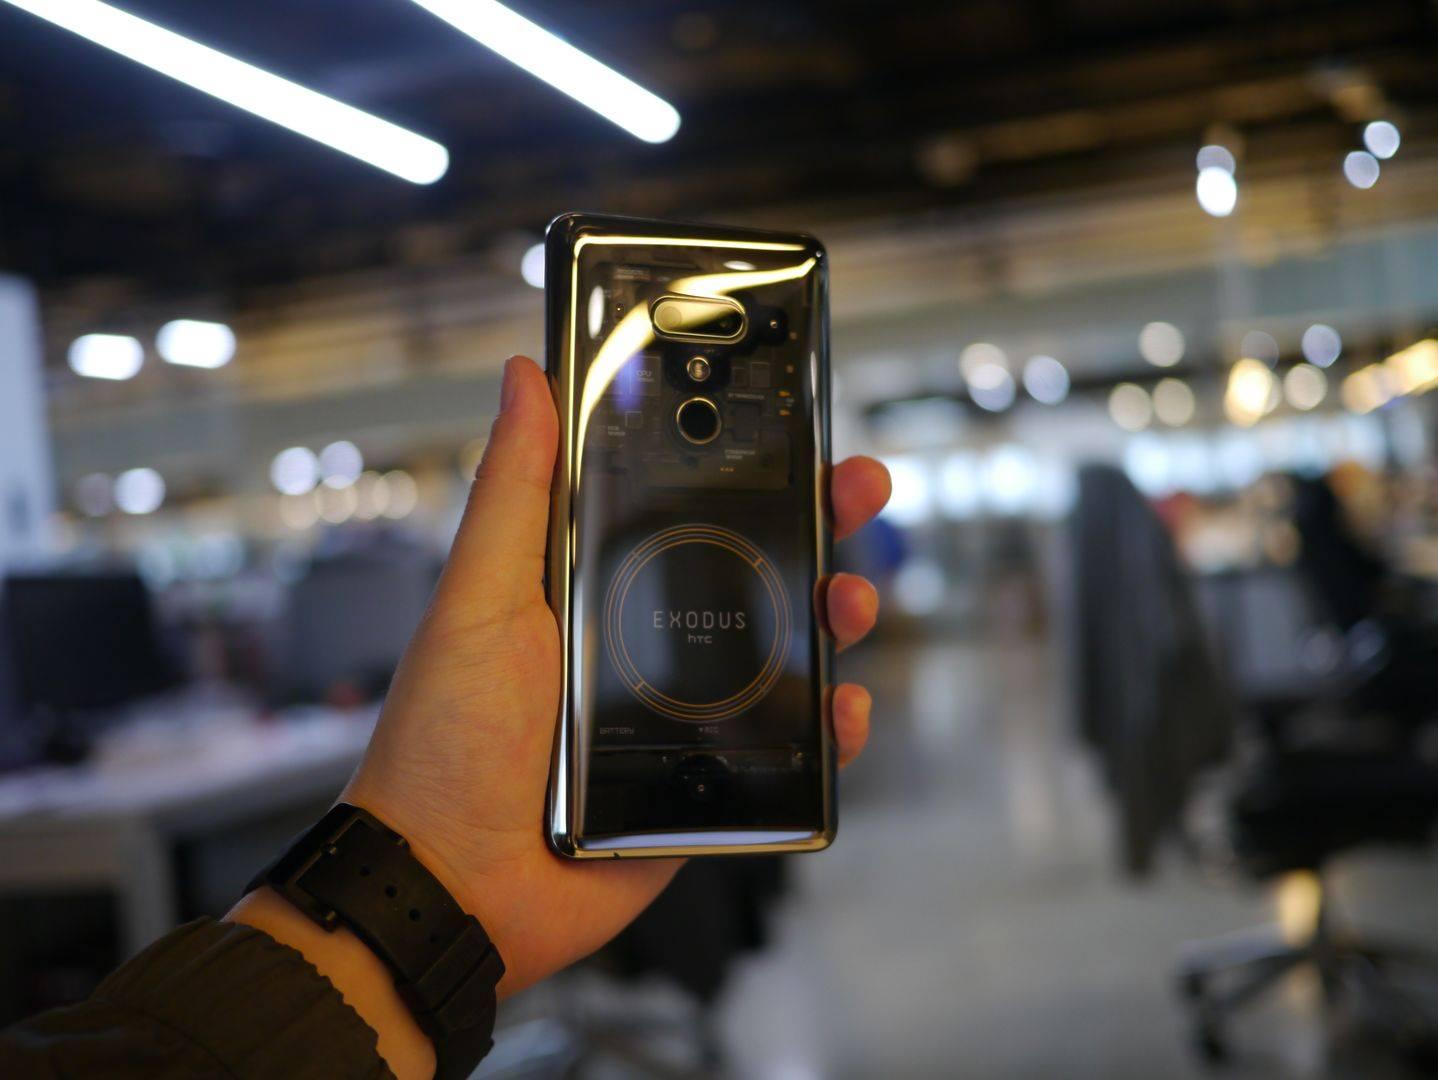 Htc's New $300 Smartphone 'Exodus 1s' Can Run a Full Bitcoin Node